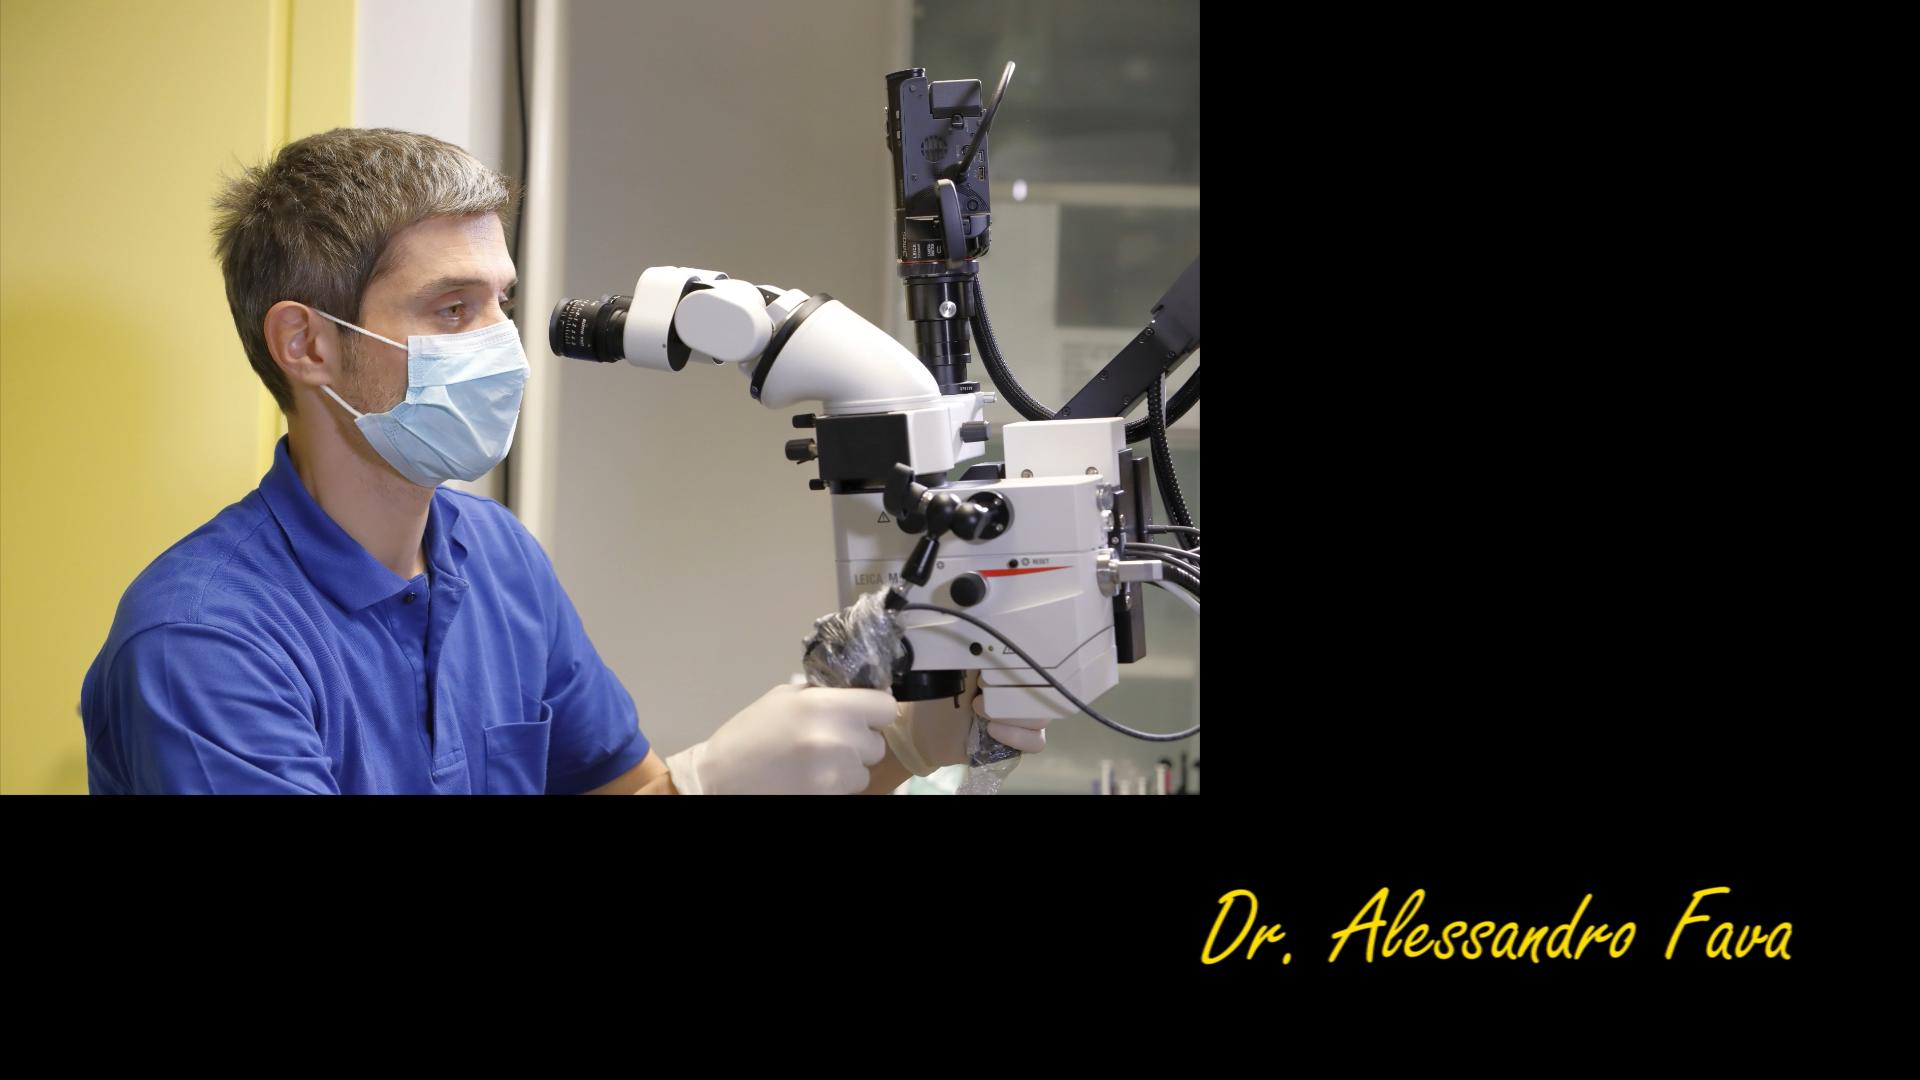 Dr Alessandro Fava